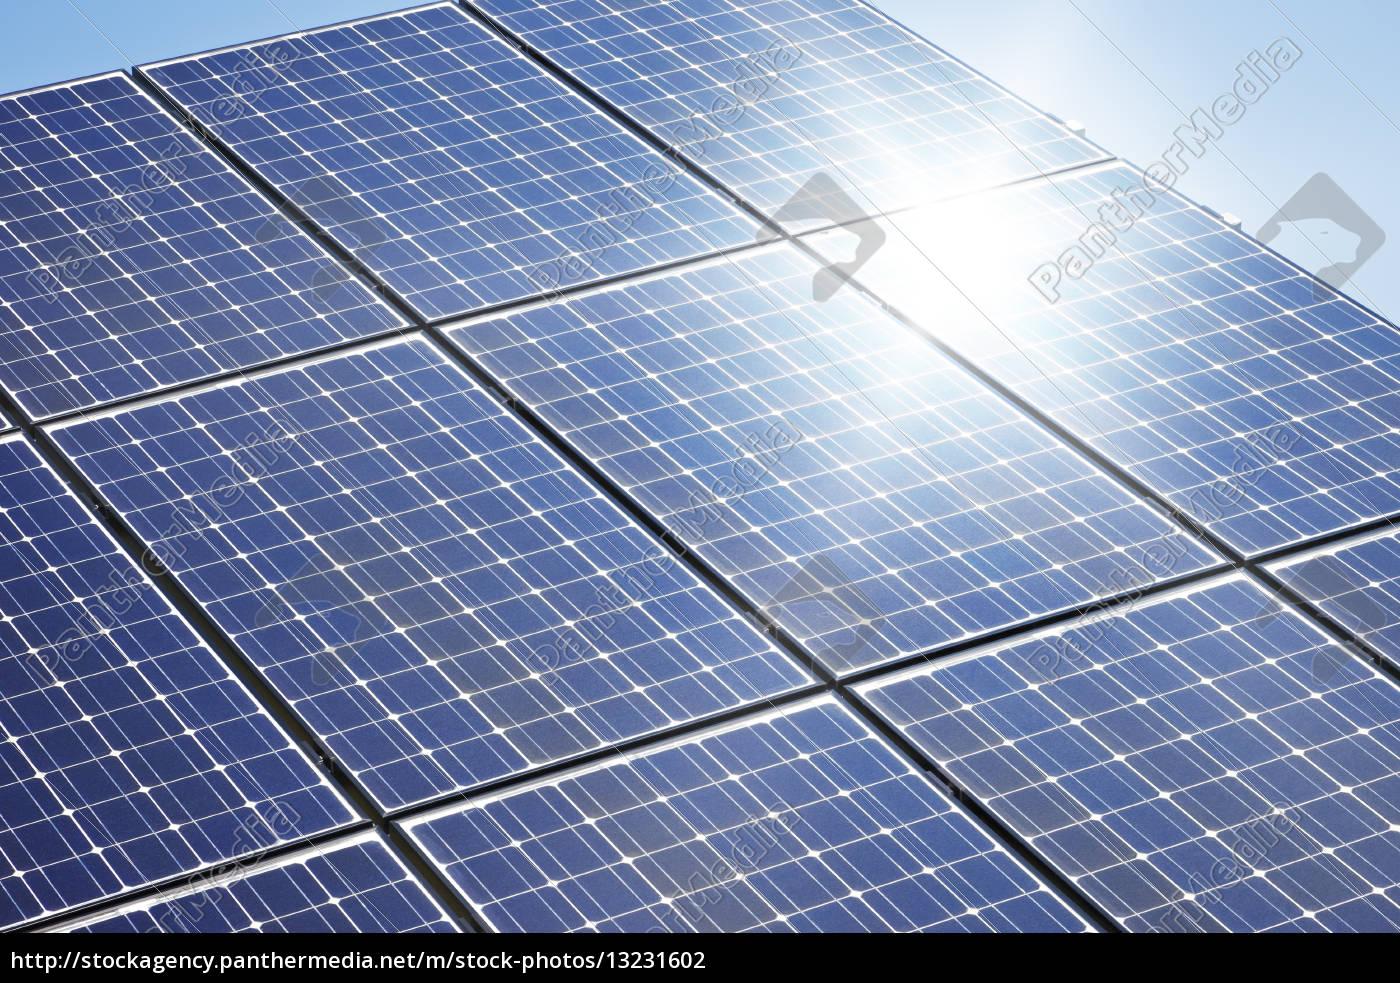 solar, plant - 13231602